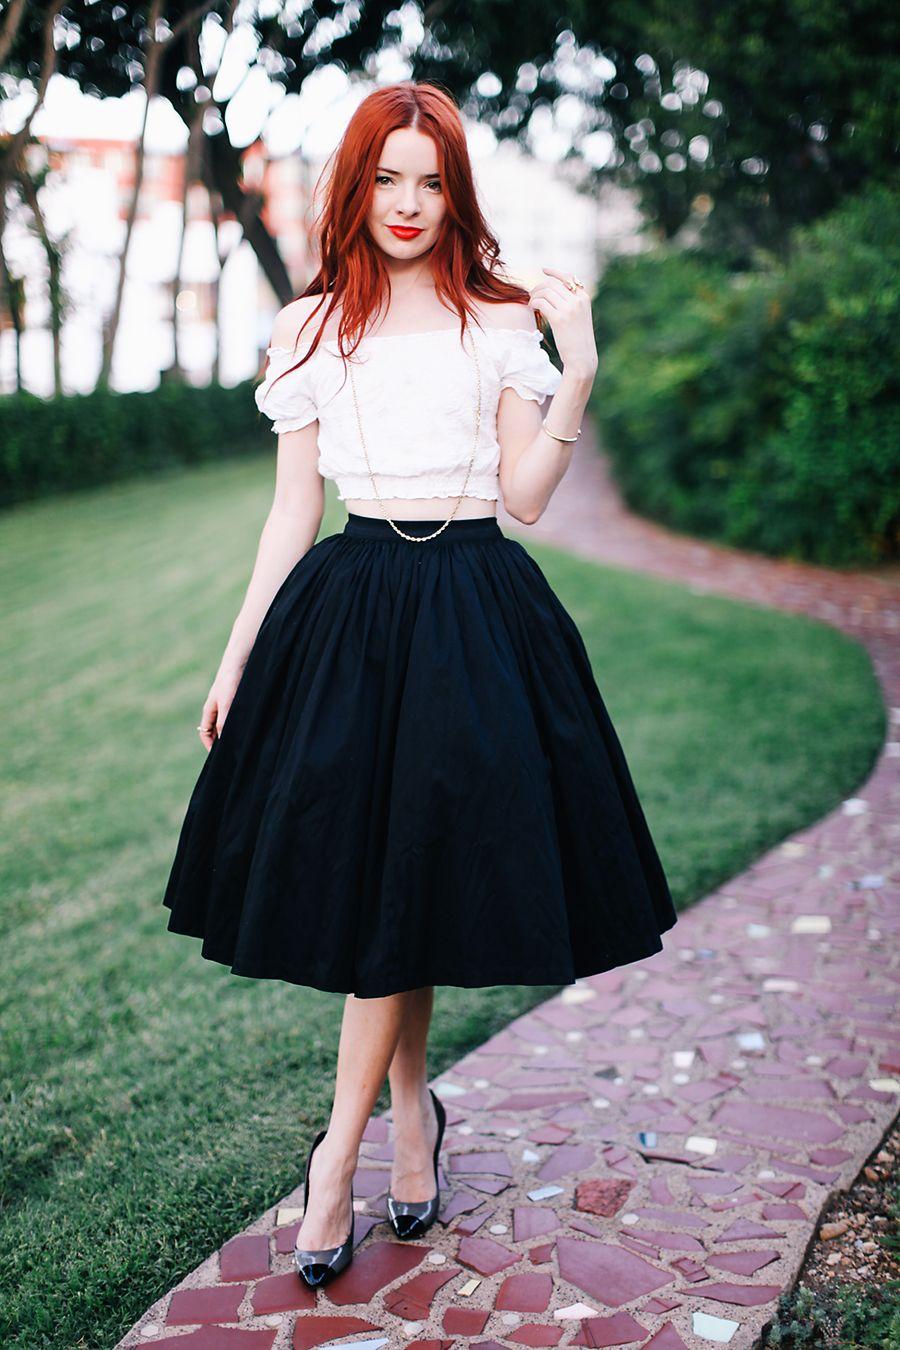 Esa falda es genial !